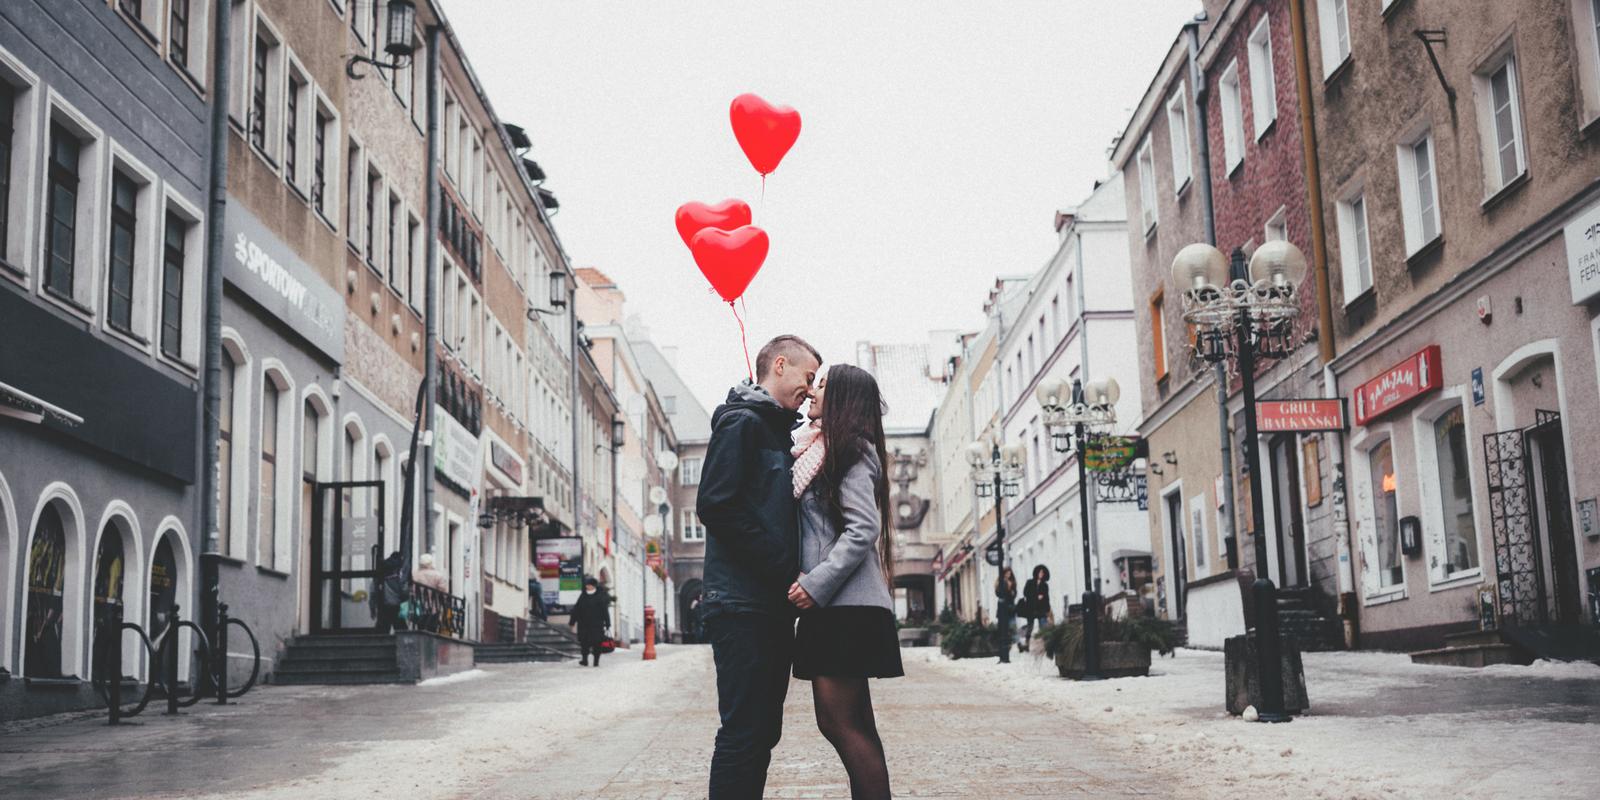 San-valentin-elogia.png